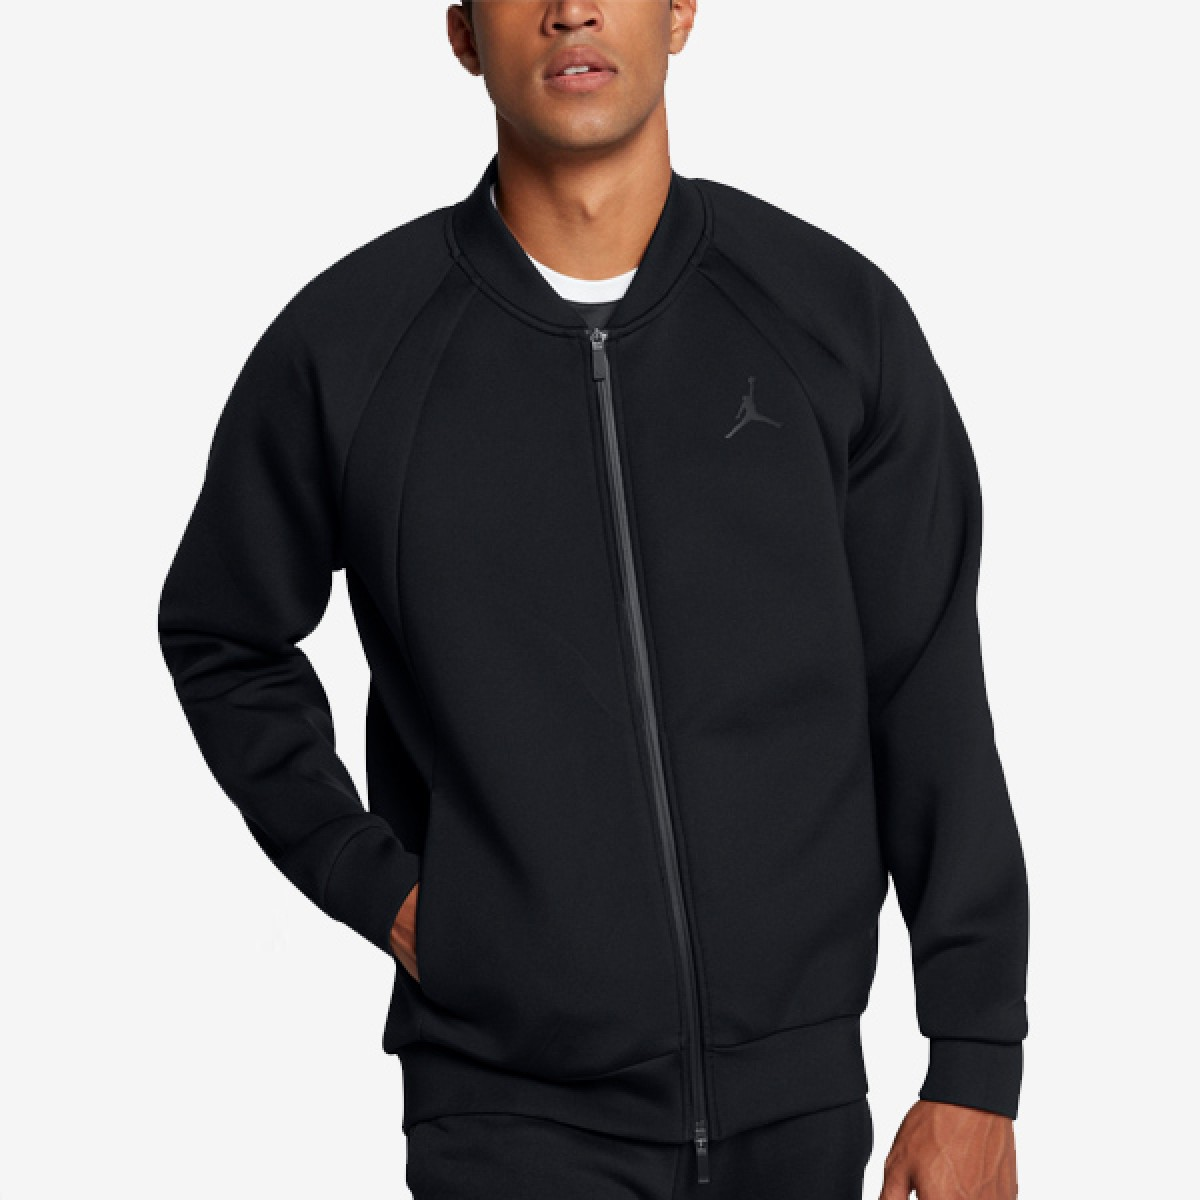 Jordan Flight Tech Jacket 'Black'